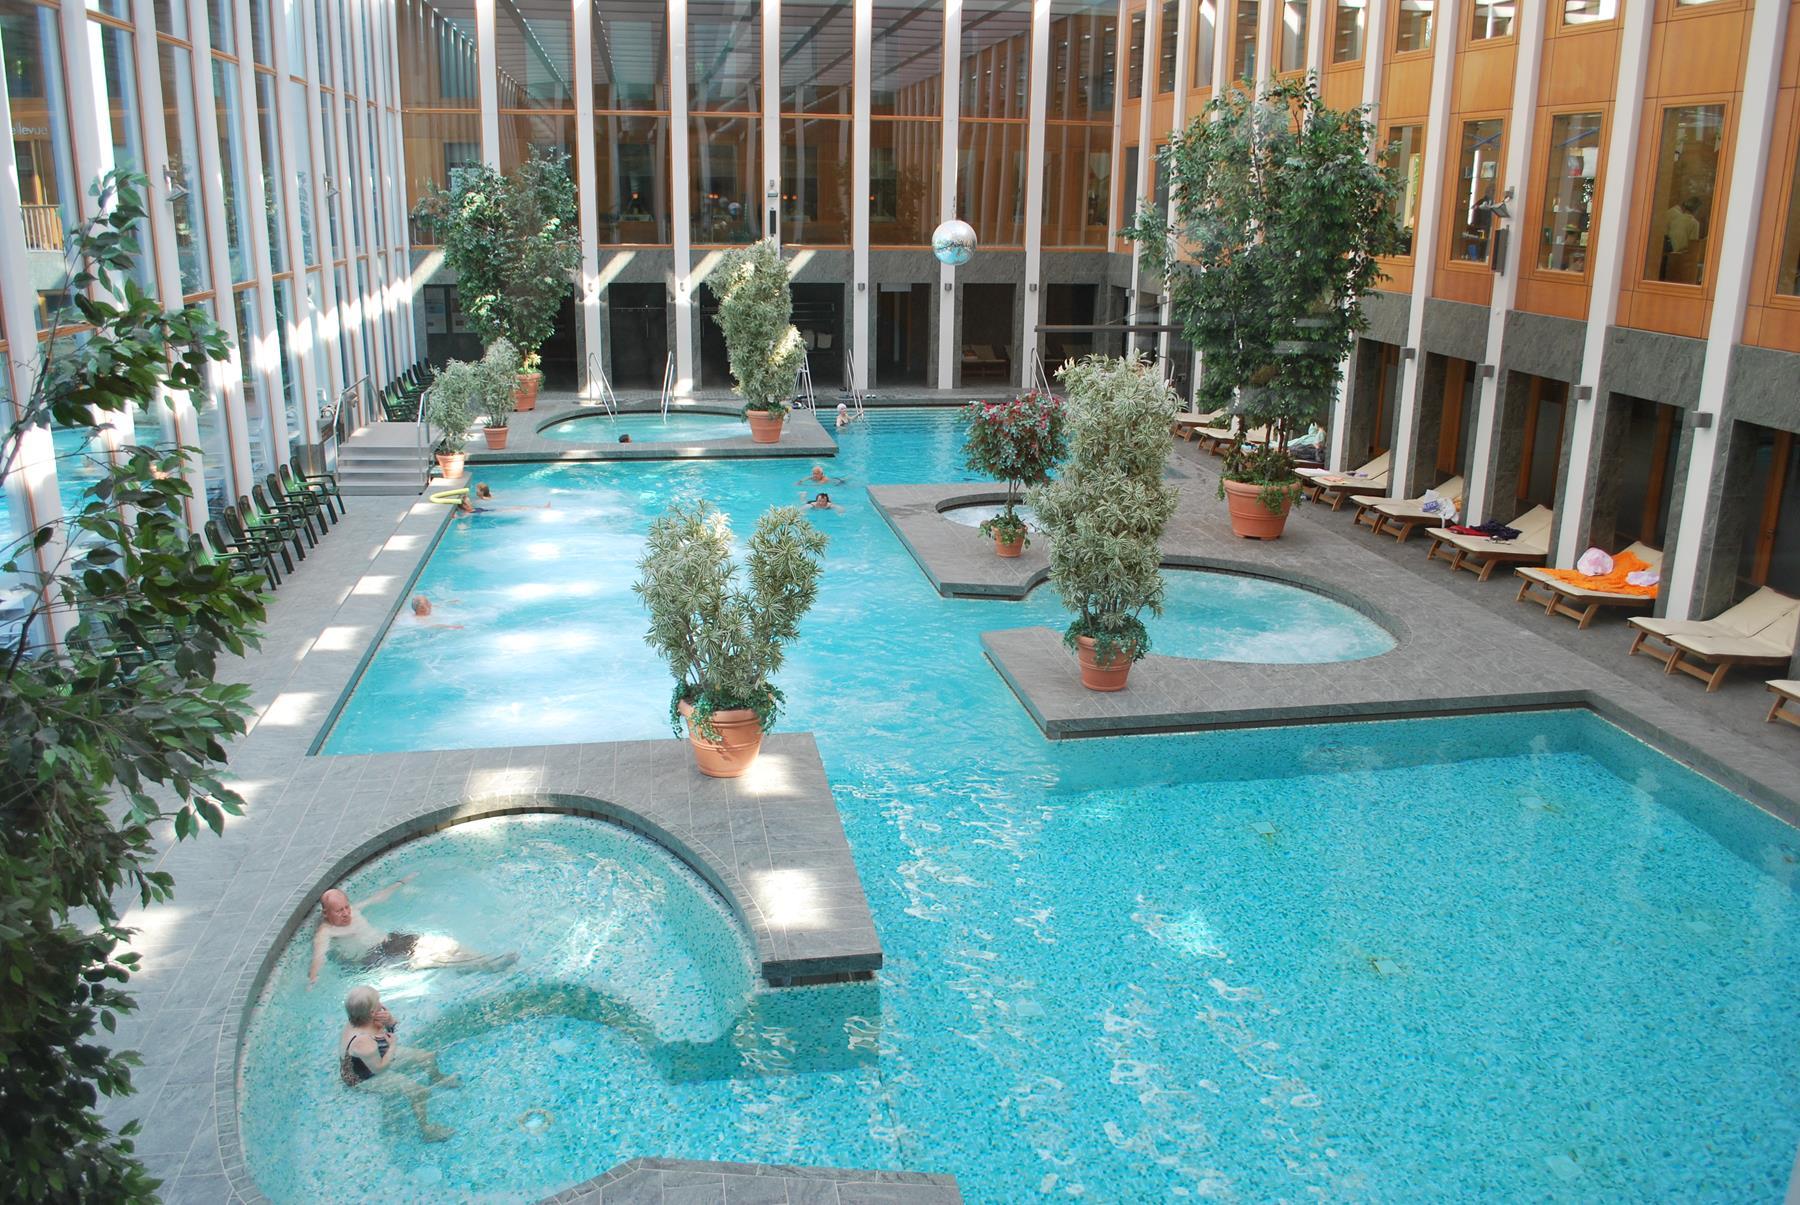 Hotel Therme Bad Saarow